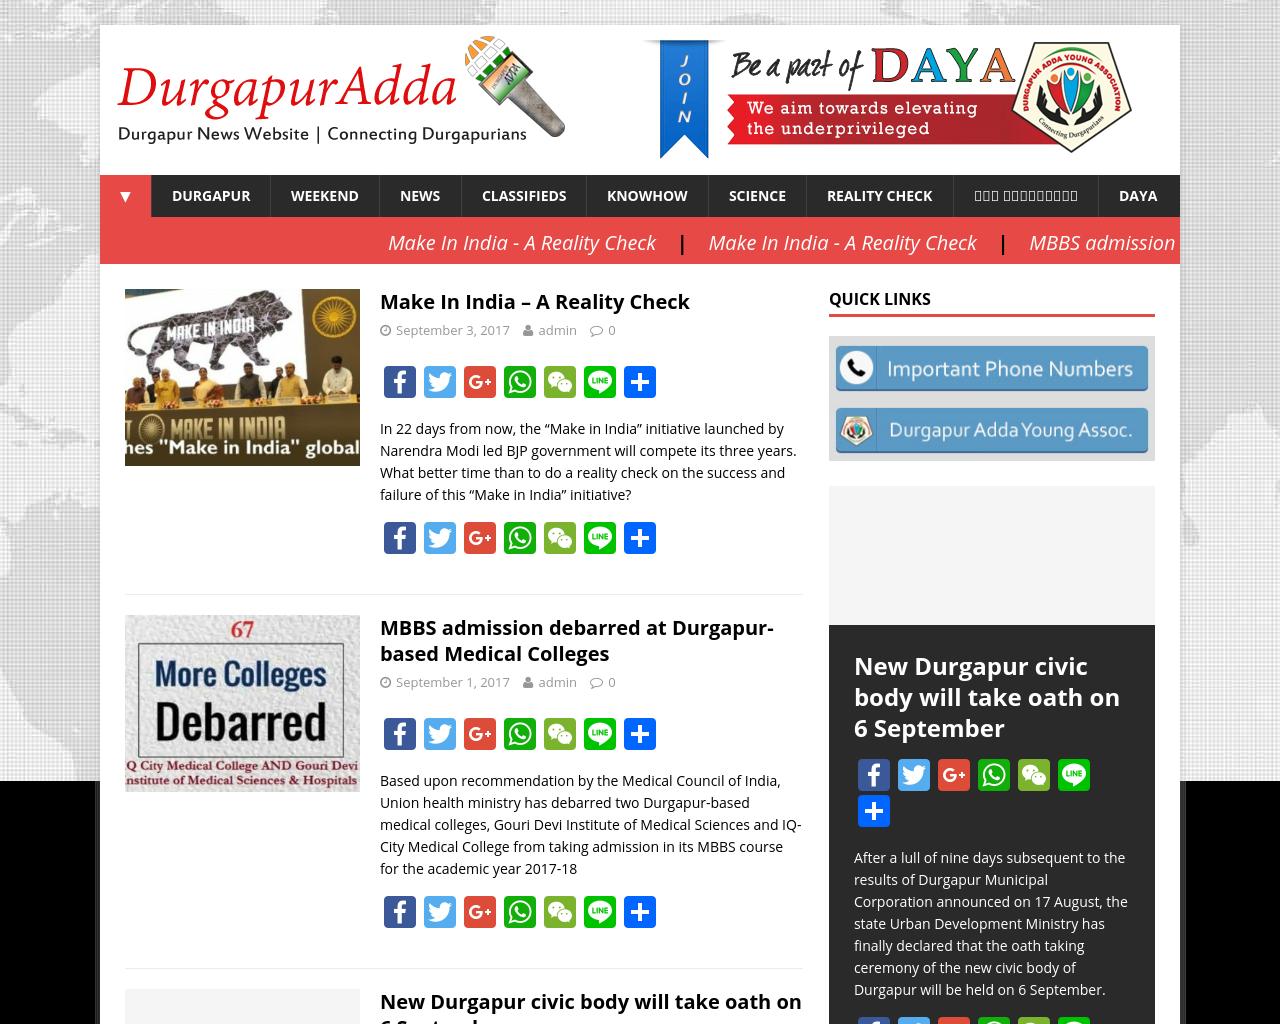 Durgapur-Adda-Advertising-Reviews-Pricing